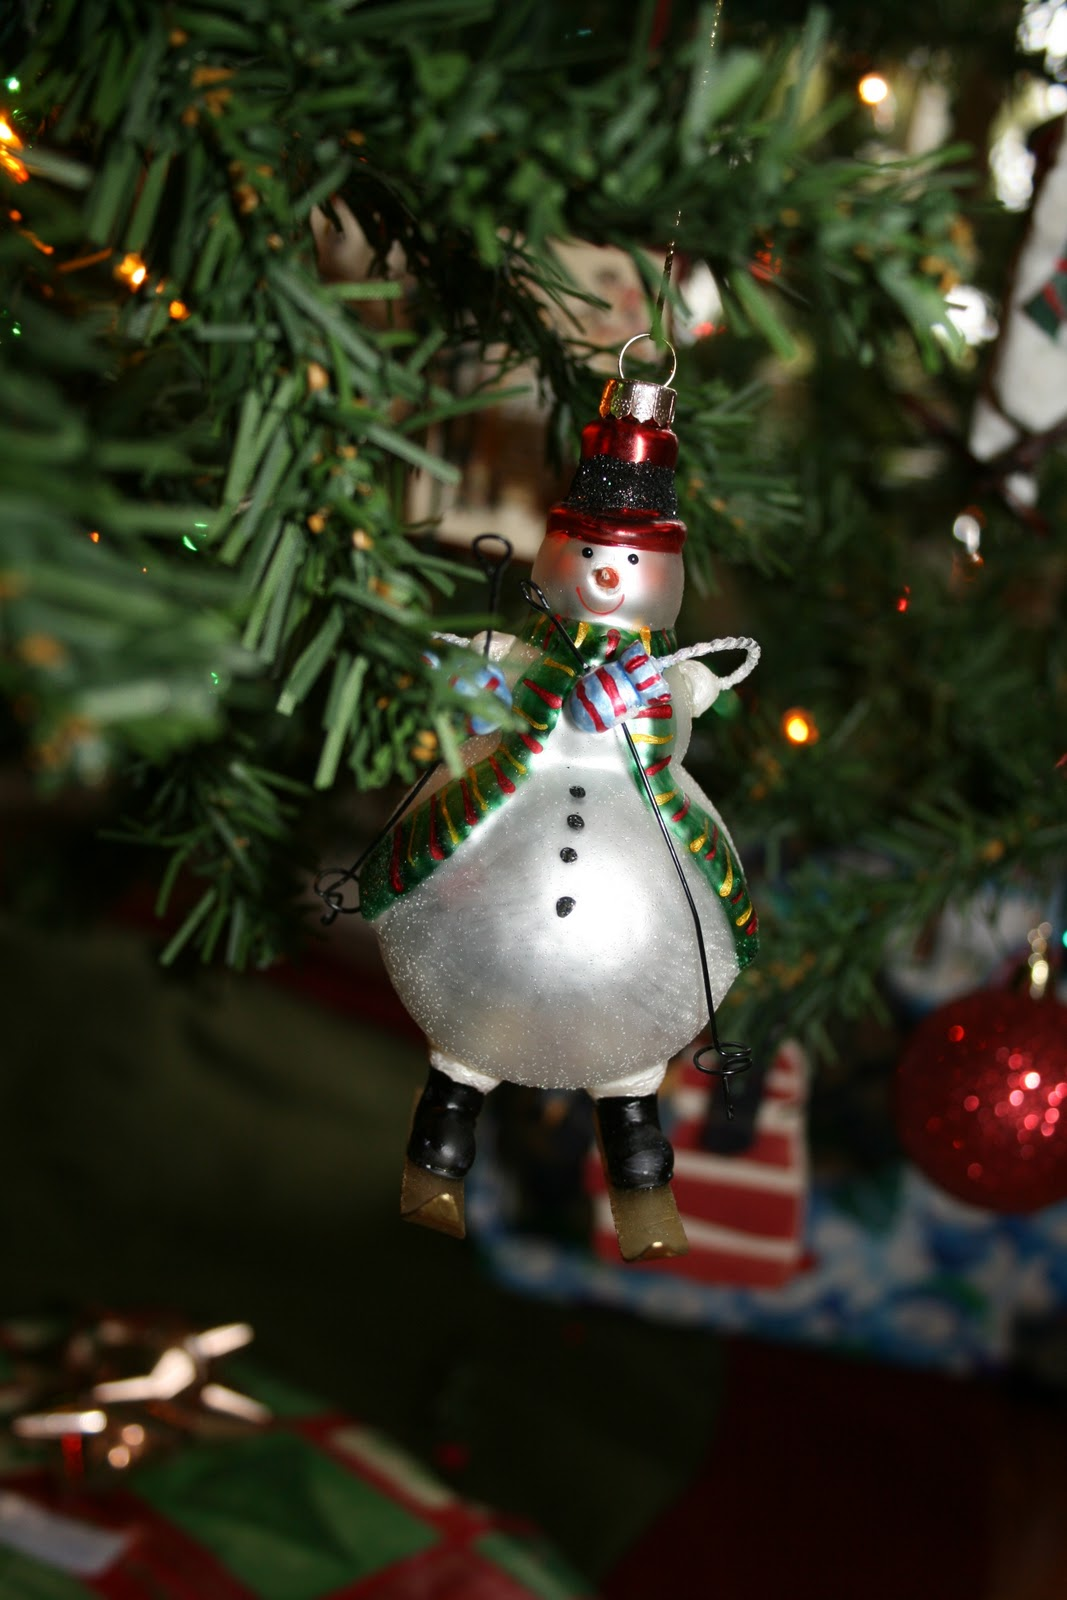 ❤: Themed Christmas Trees?